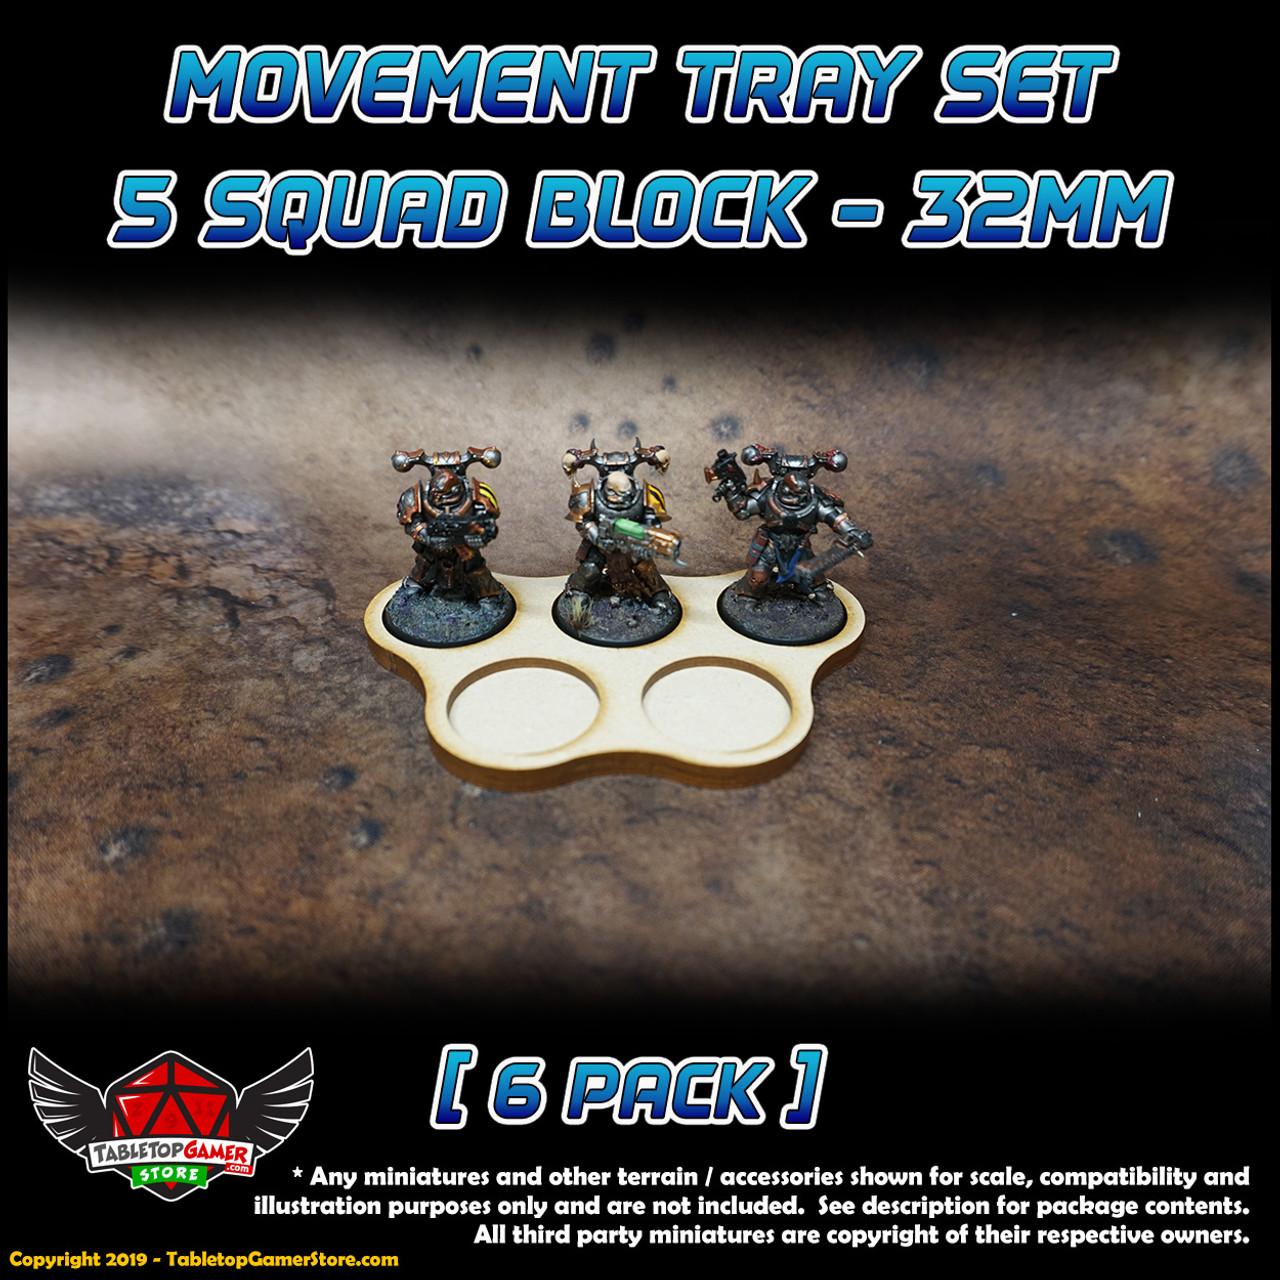 32mm Movement Tray Set - 5 Model Block - 6 Pack